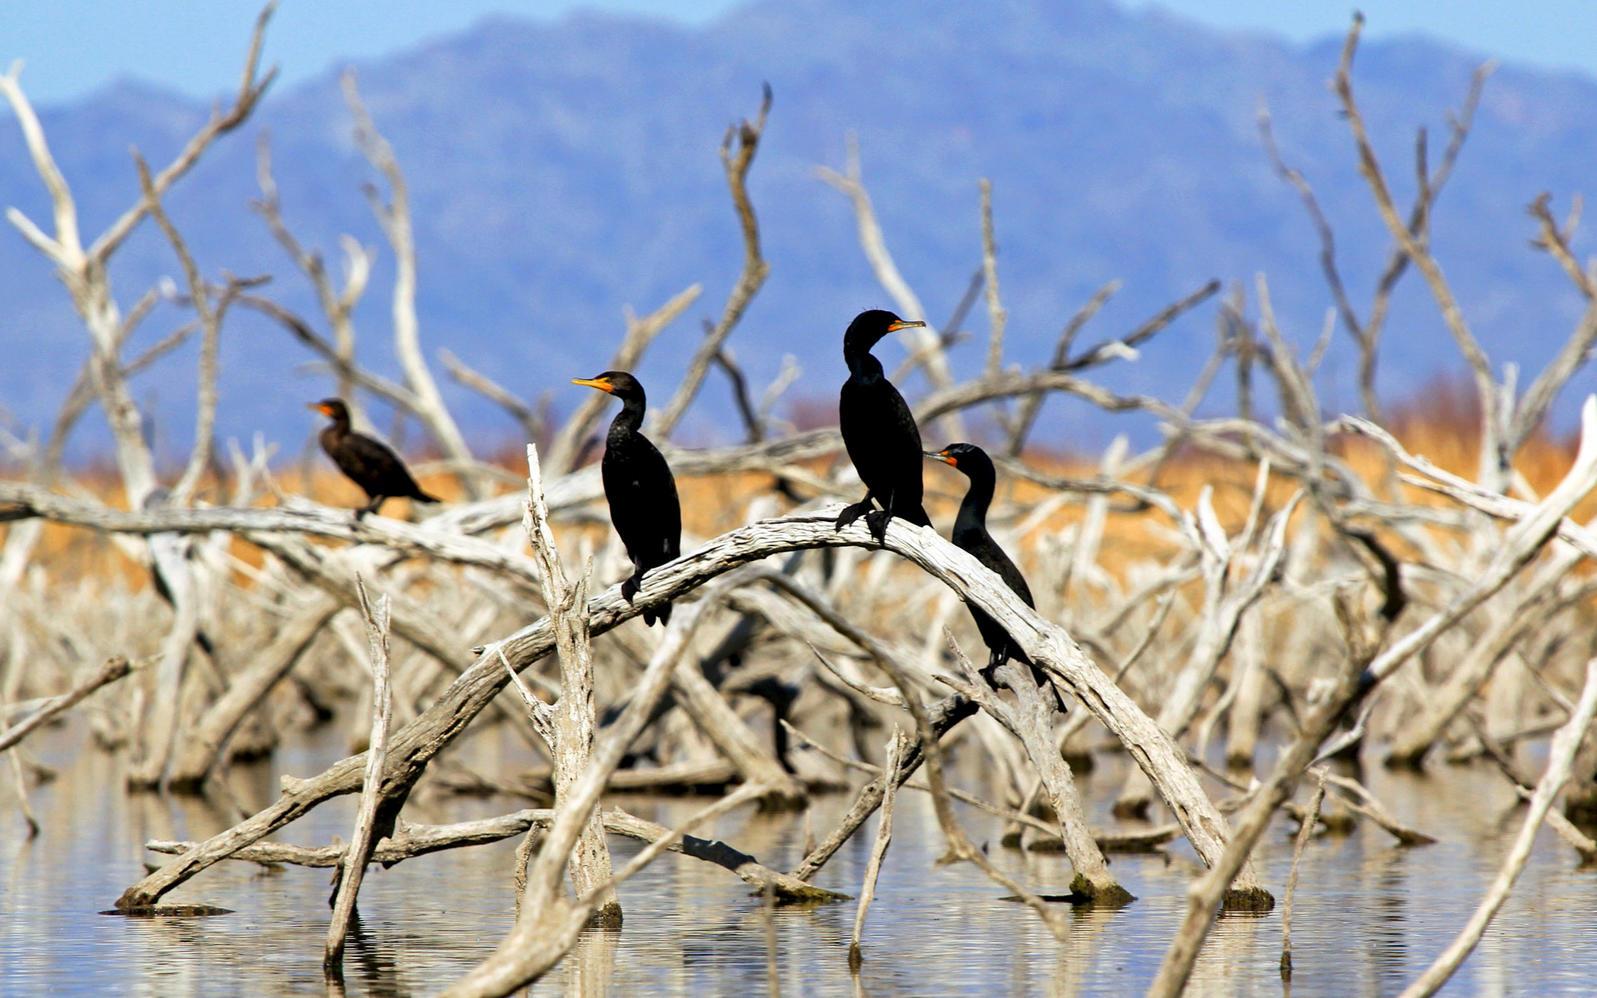 Double-crested Cormorants. John West/Great Backyard Bird Count